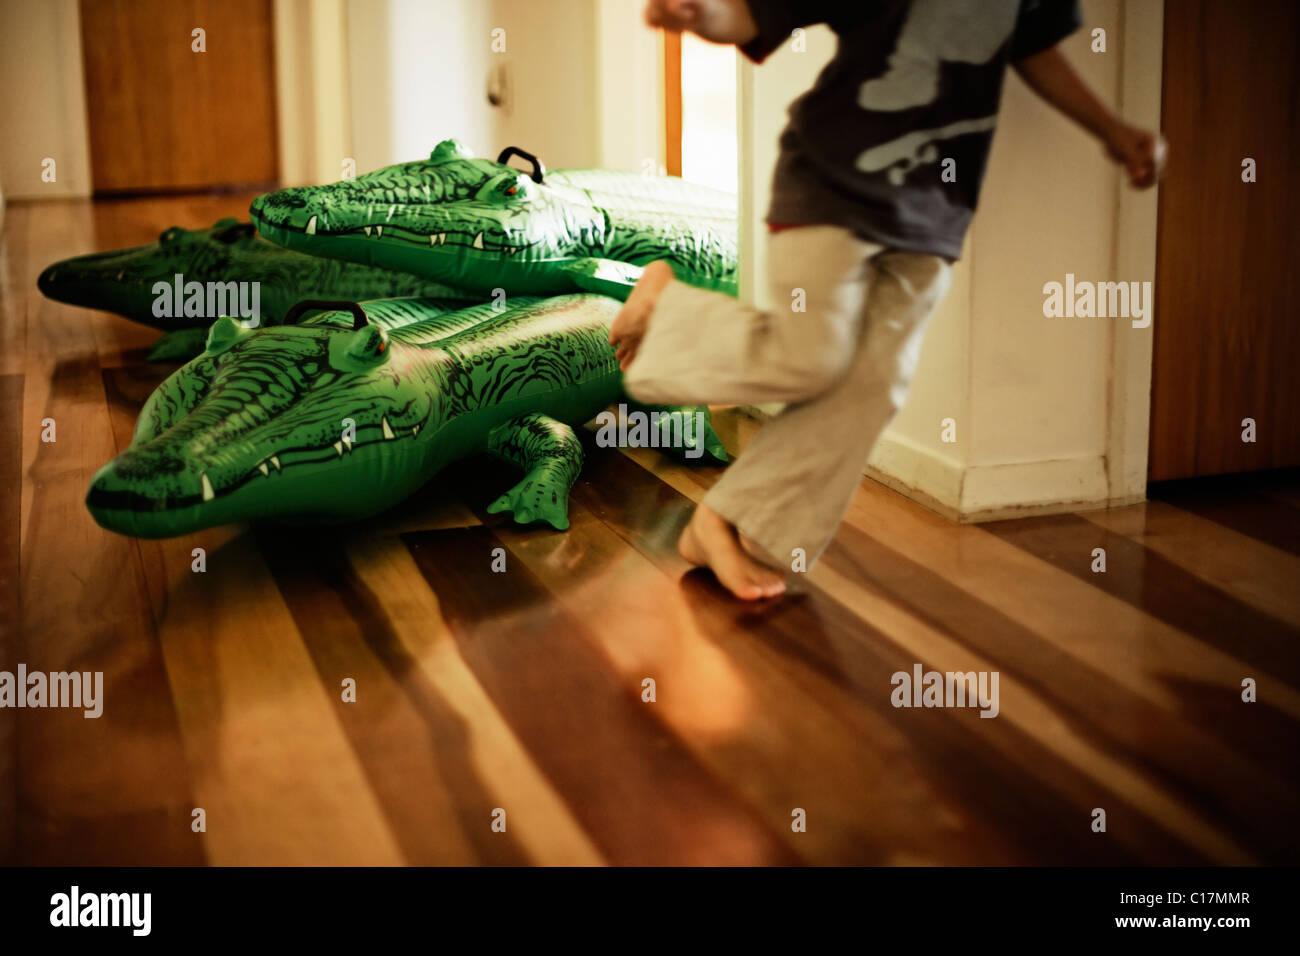 Serie de cocodrilo inflable. Boy a partir de seis años se escapa. Imagen De Stock